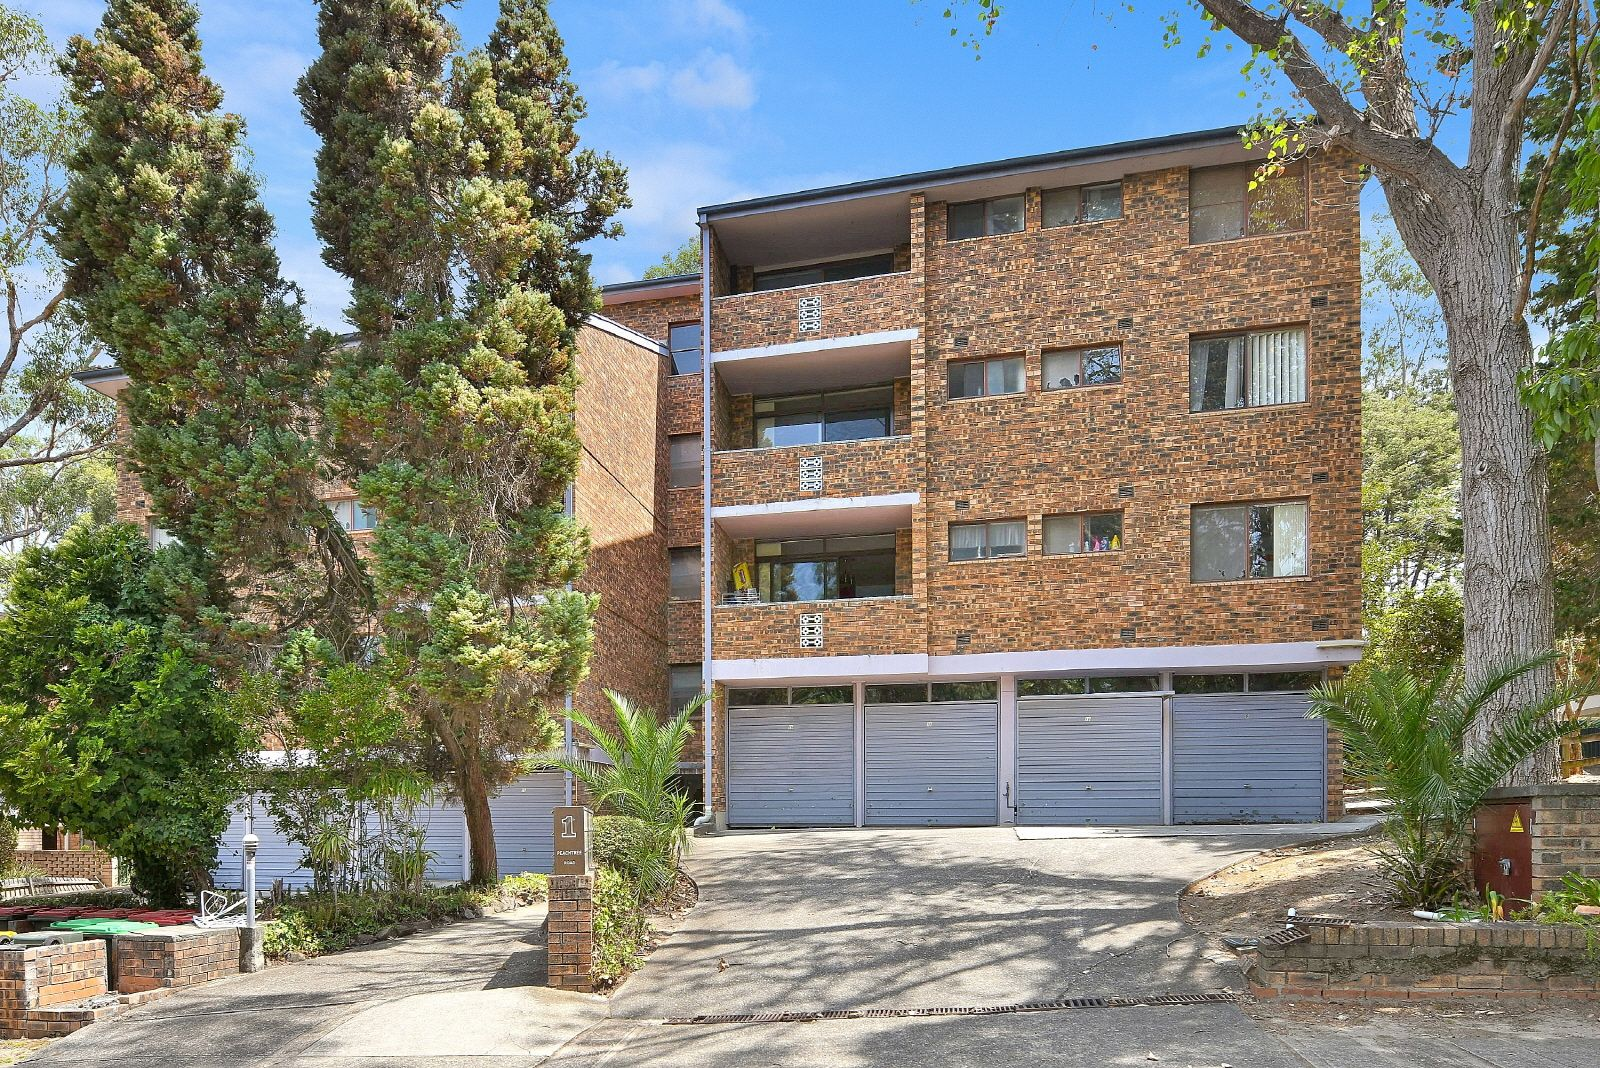 5/1 Peach Tree Road, Macquarie Park NSW 2113, Image 0